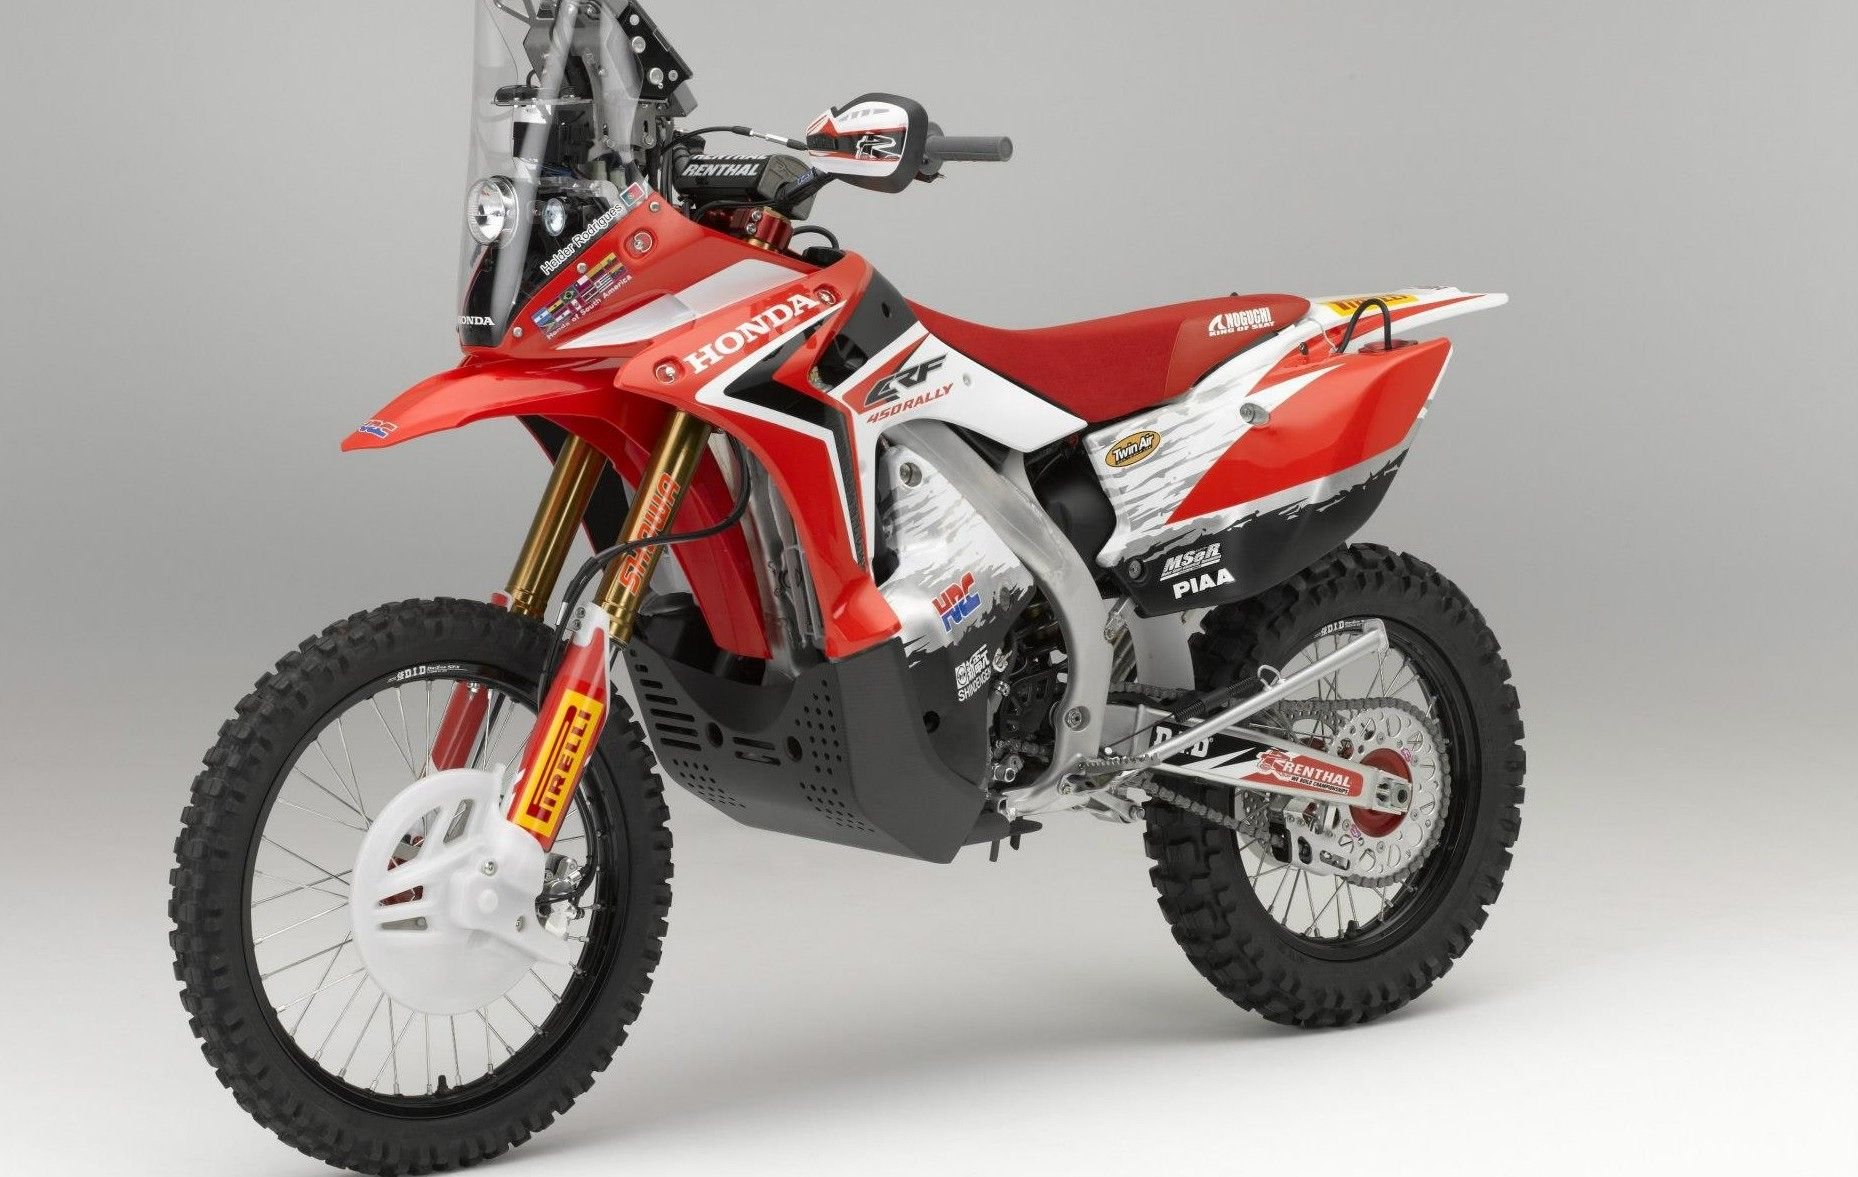 yamaha dual sport 450 - google search | motorcycles | pinterest